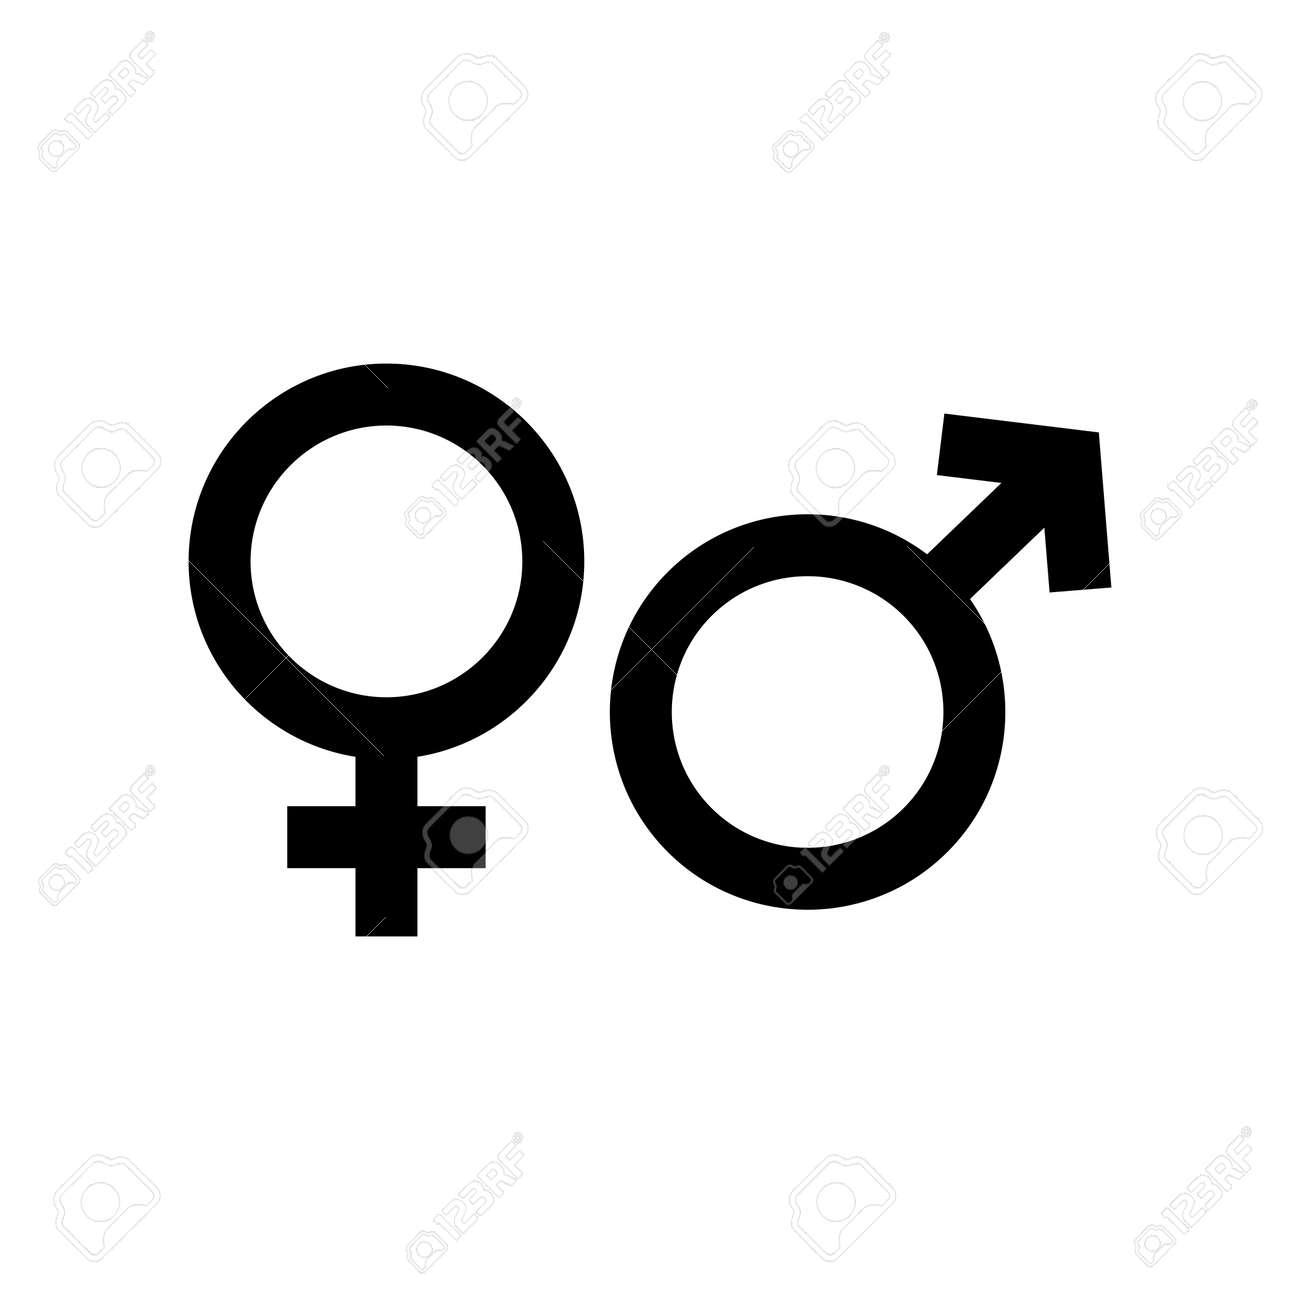 Gender symbol. design template vector - 145682456